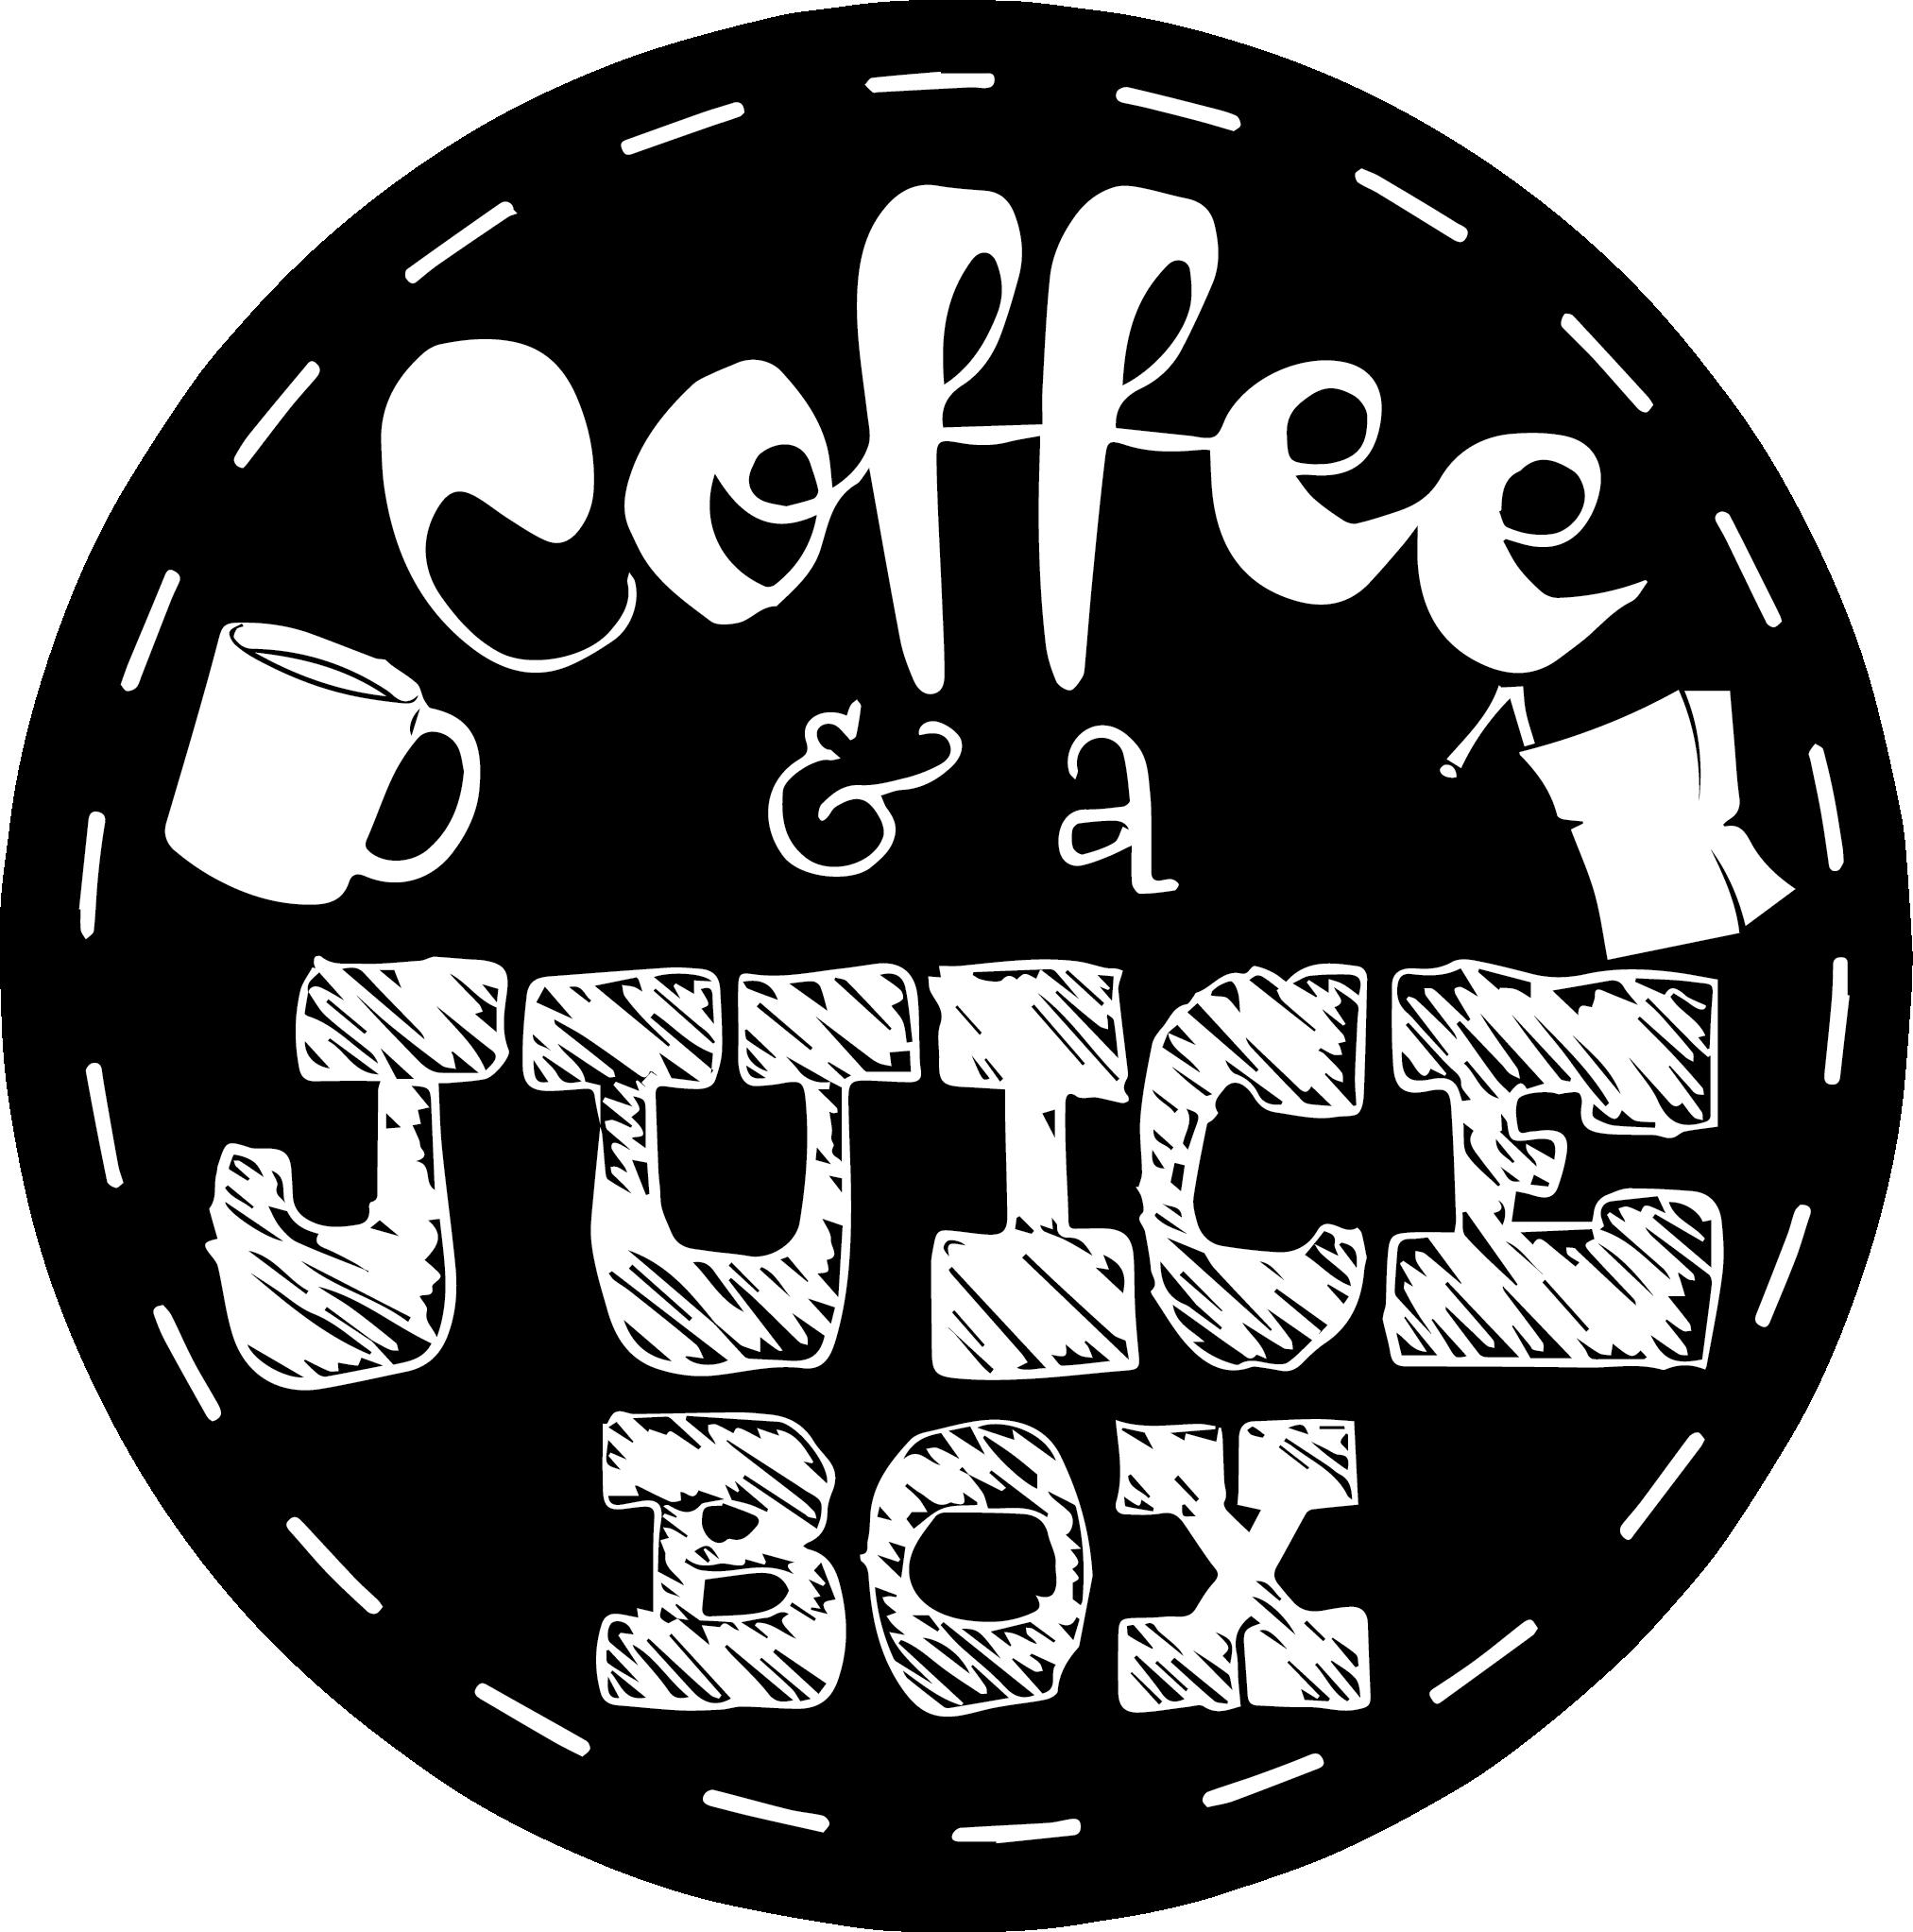 Coffee & a Juice Box